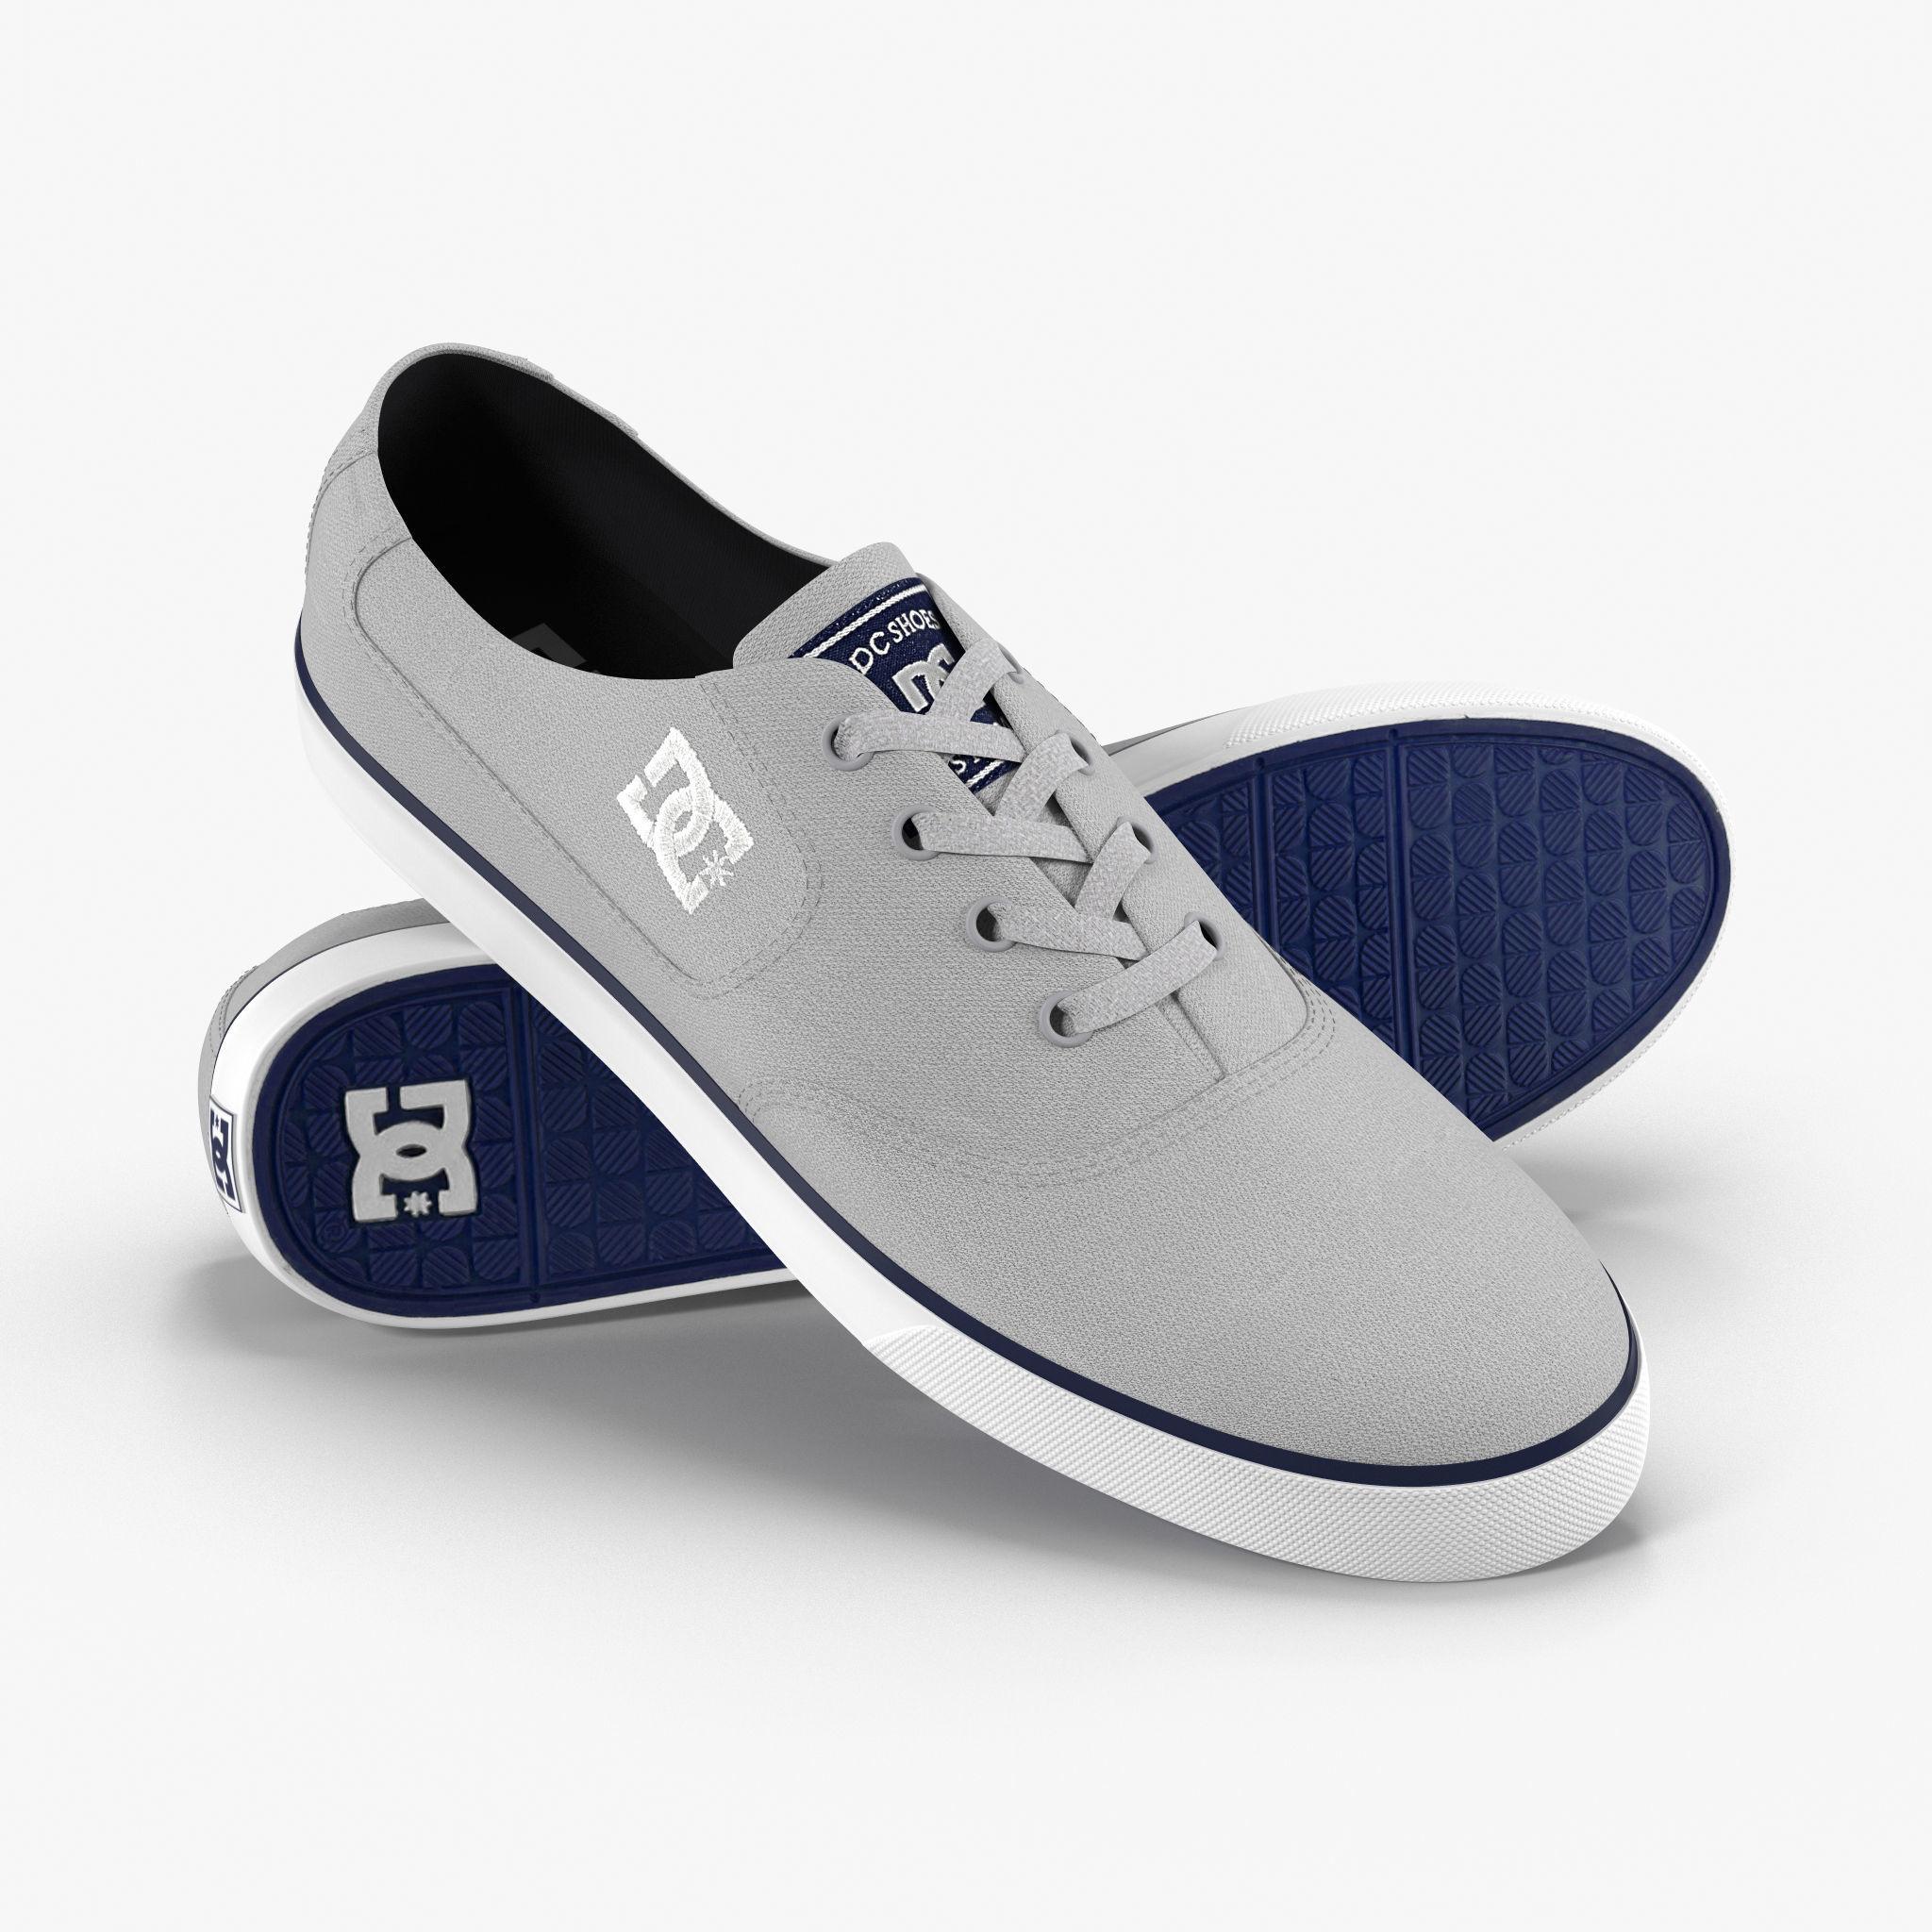 DC Shoes - Flash TX - Grey 3D model